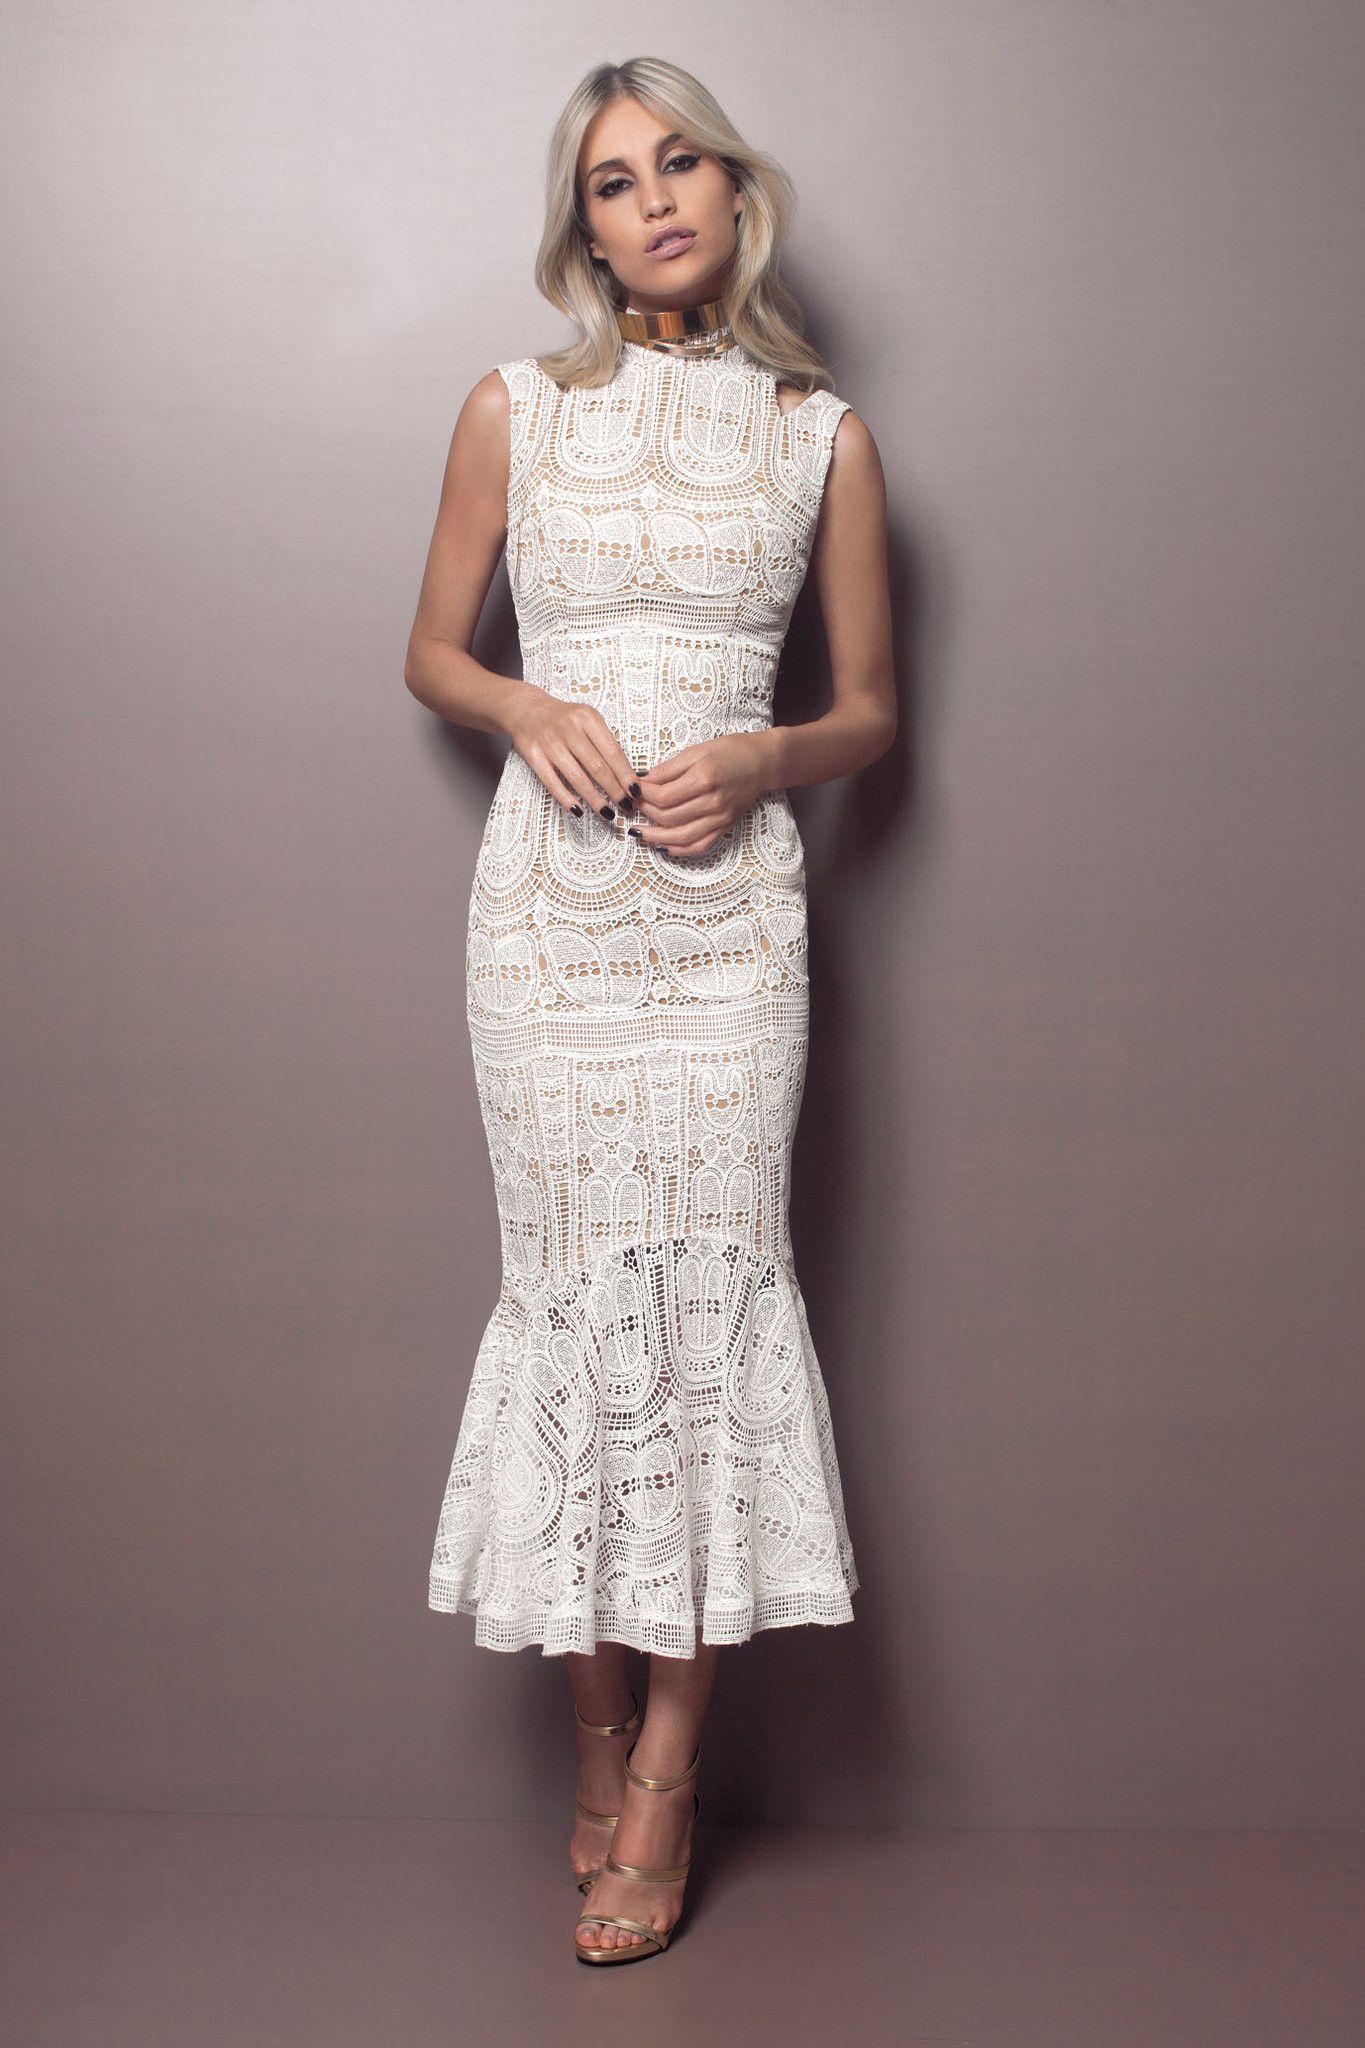 ba3445156 Resultado de imagem para vestido branco midi | On that day!♡ | Prom ...